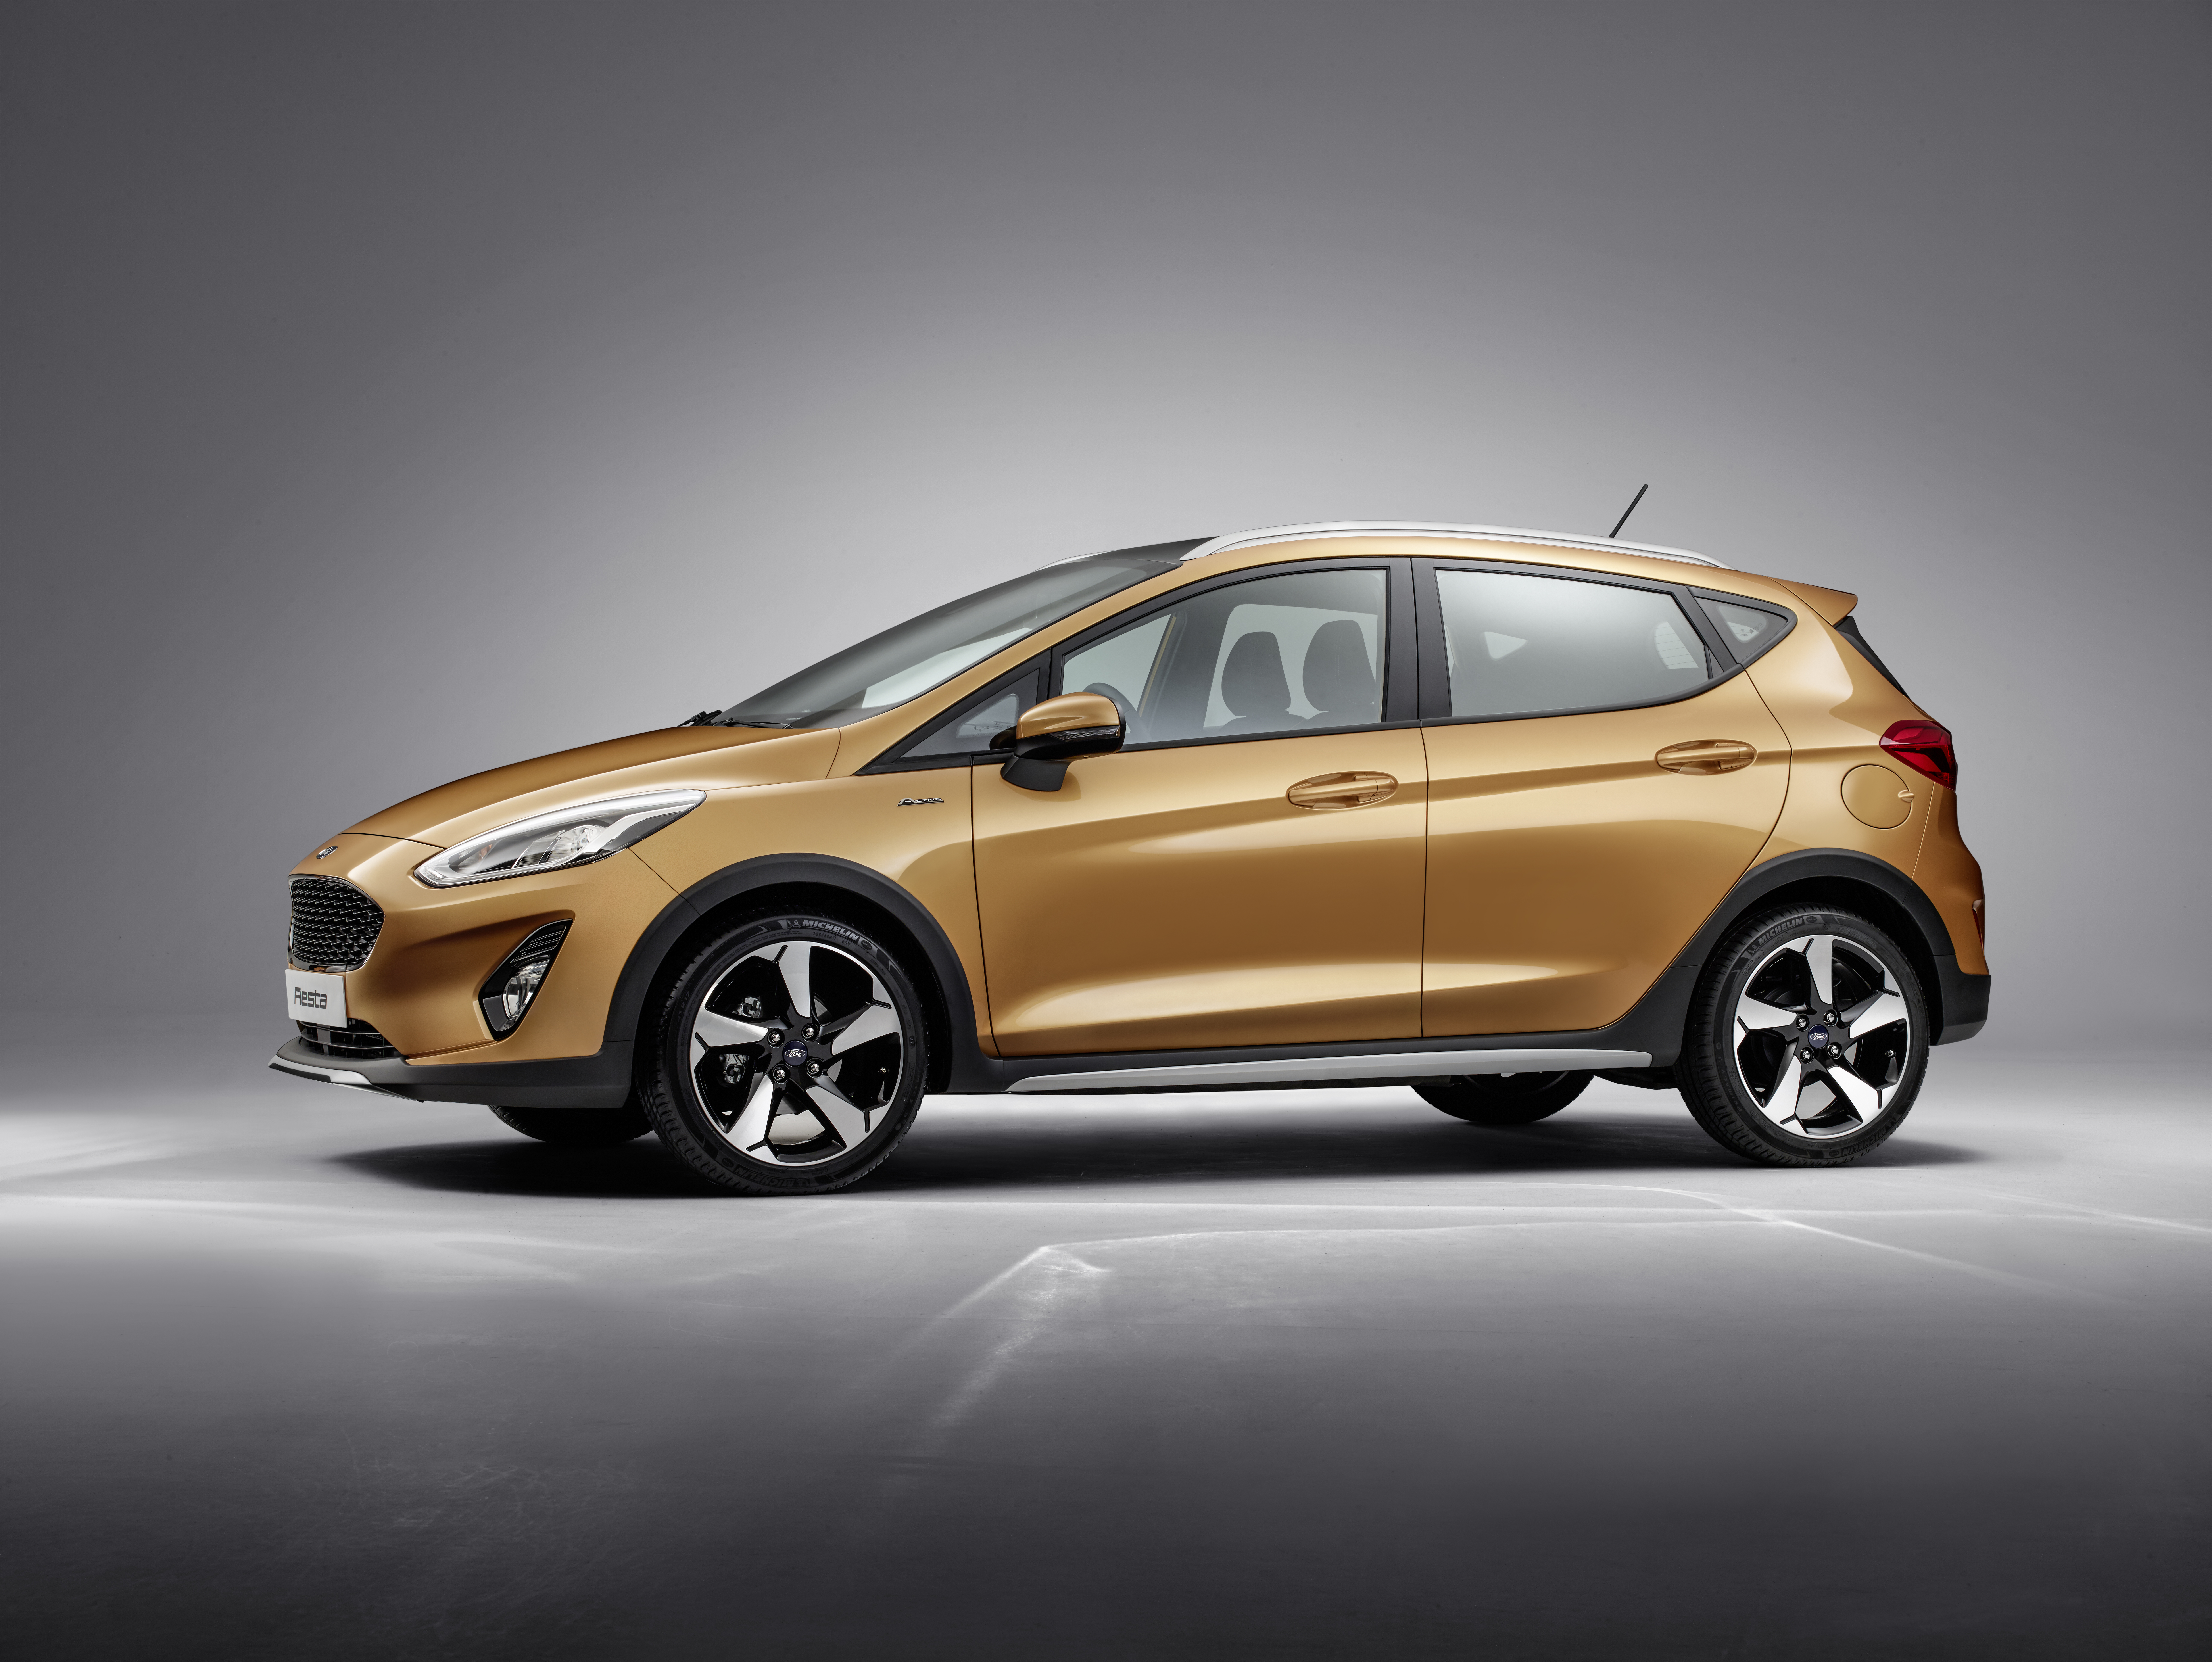 Next-gen Ford Fiesta arrives – four variants, new tech Image #586114